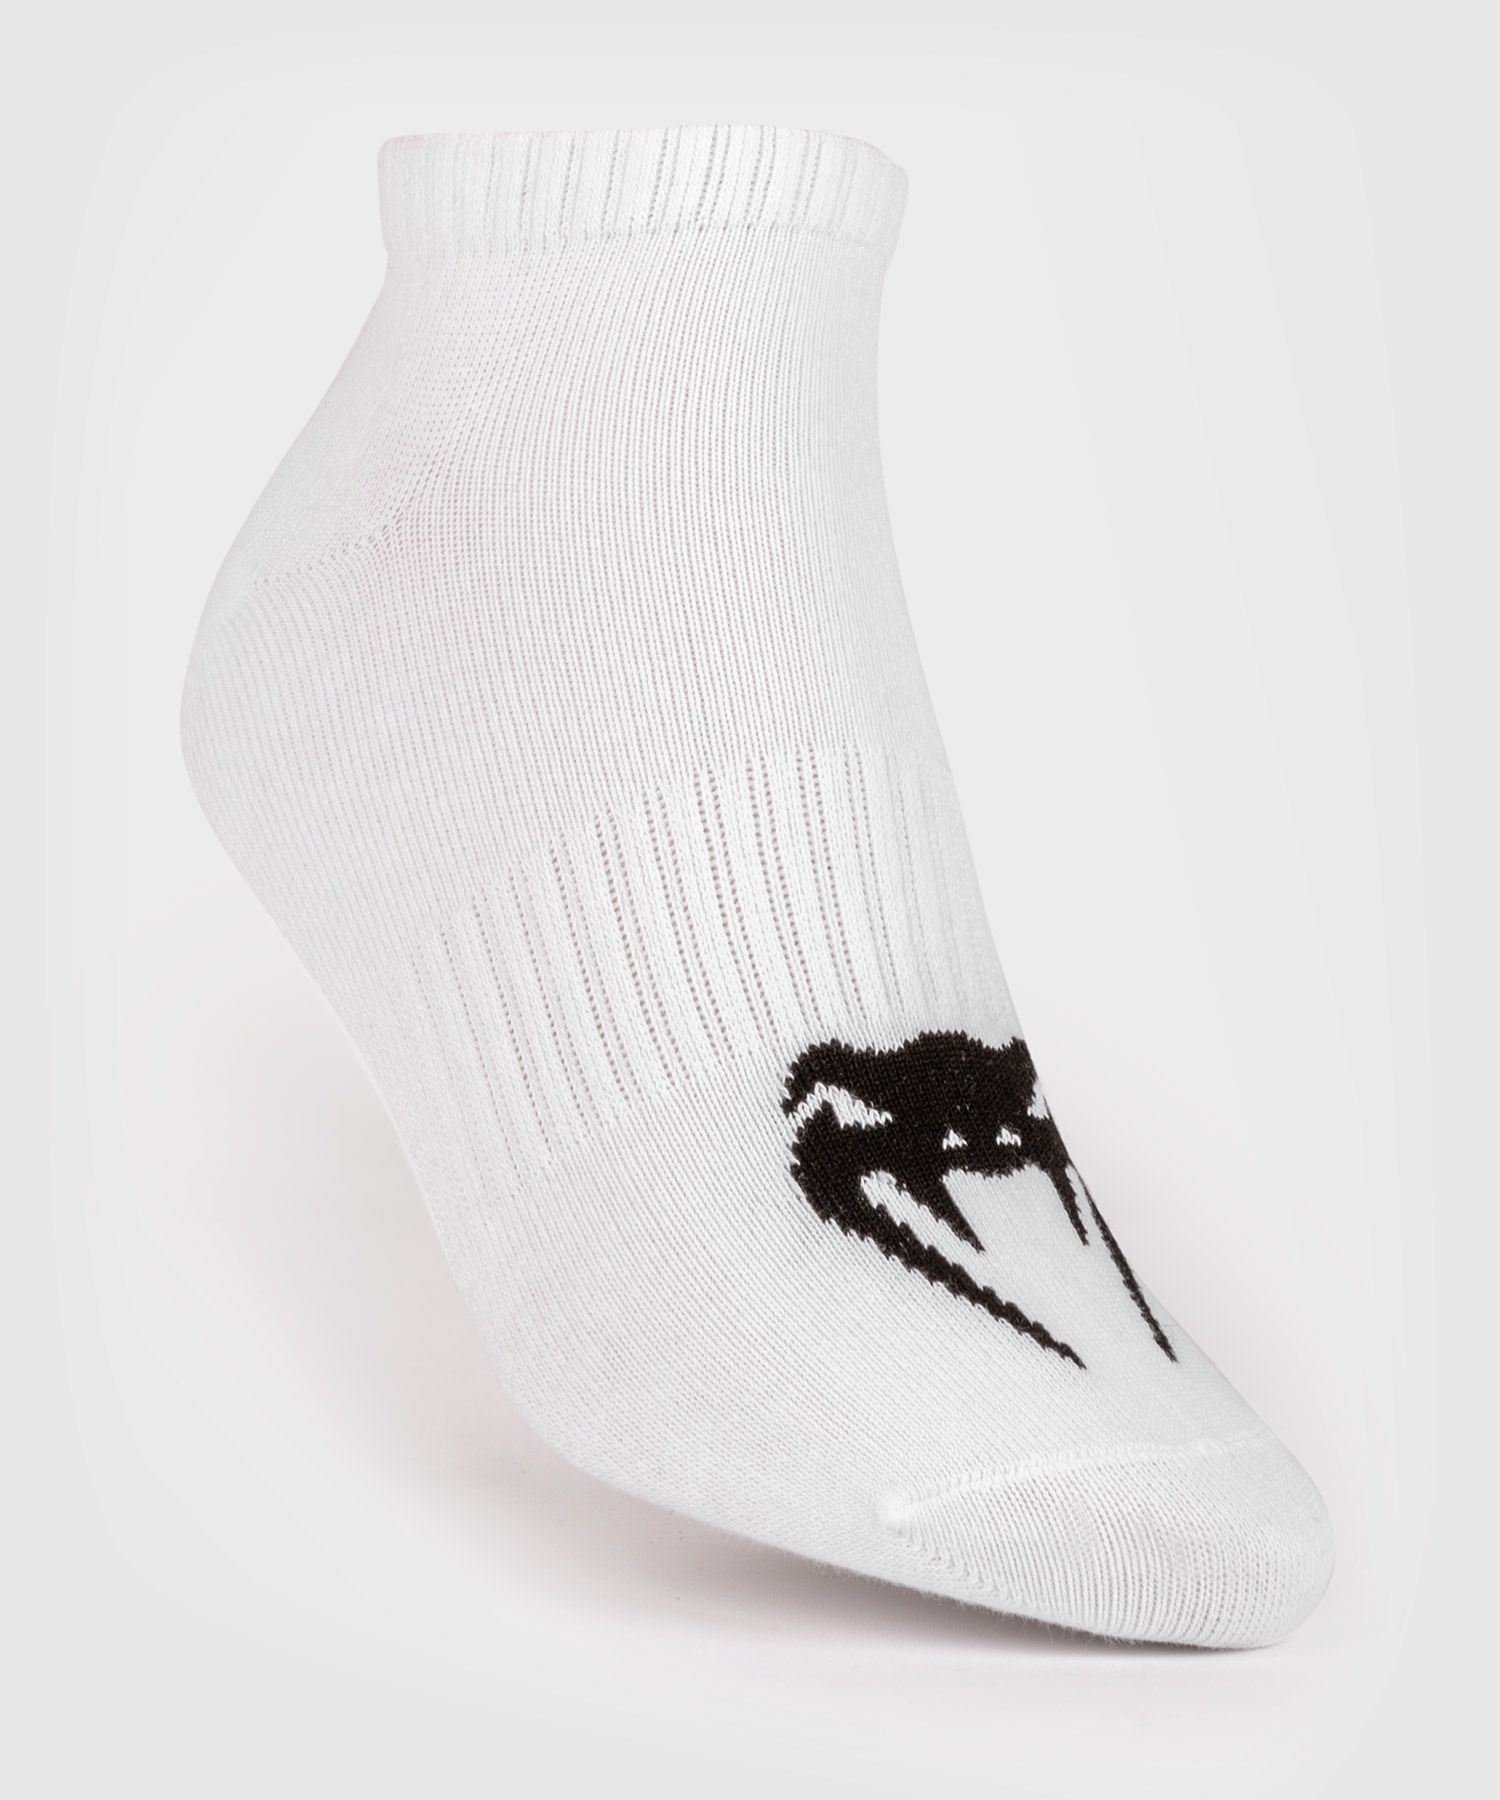 Venum Classic 浅口袜子三双 - 白色/黑色